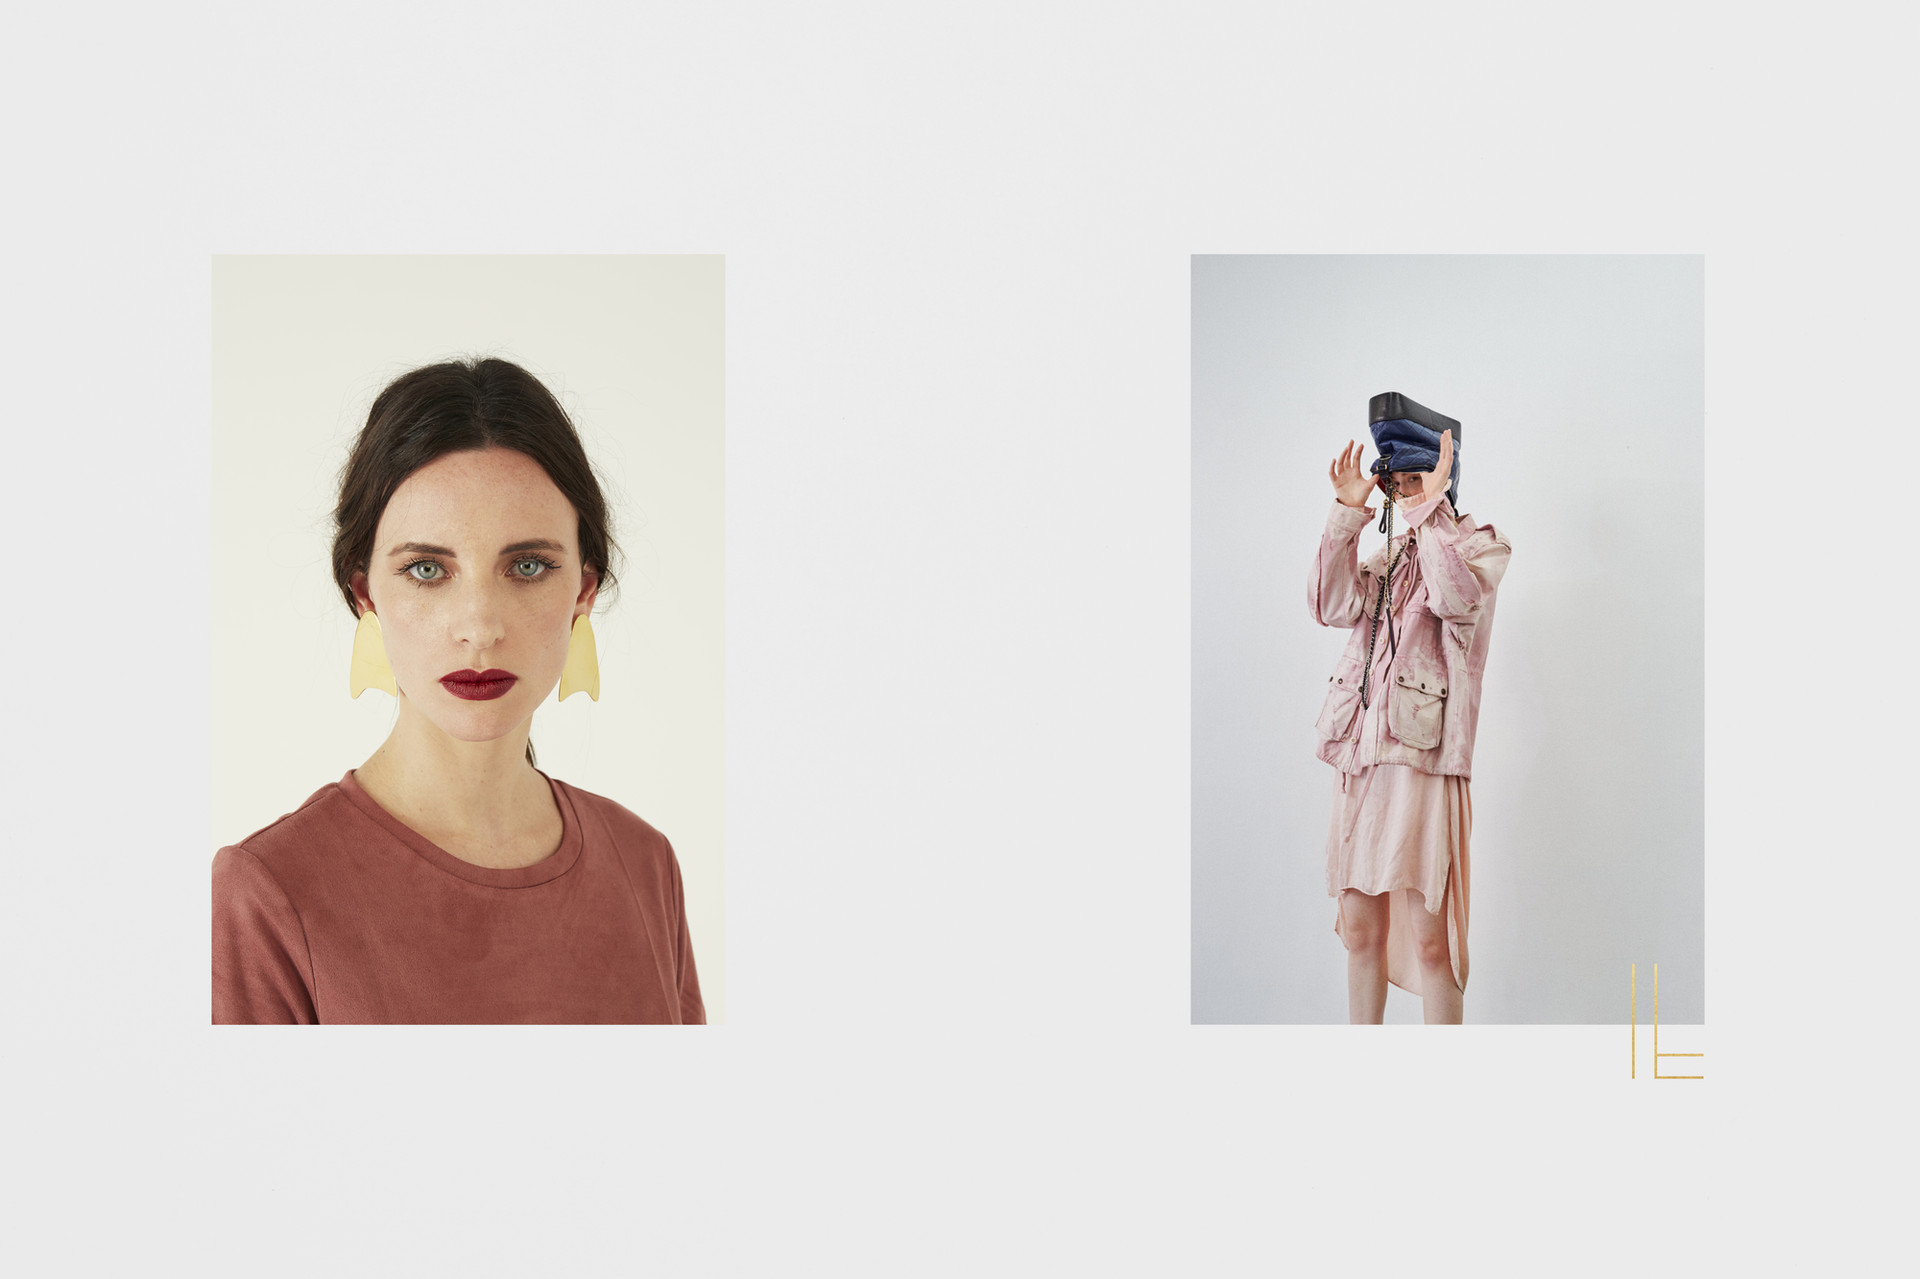 Fagerström Studio | The Line | Brand Identity